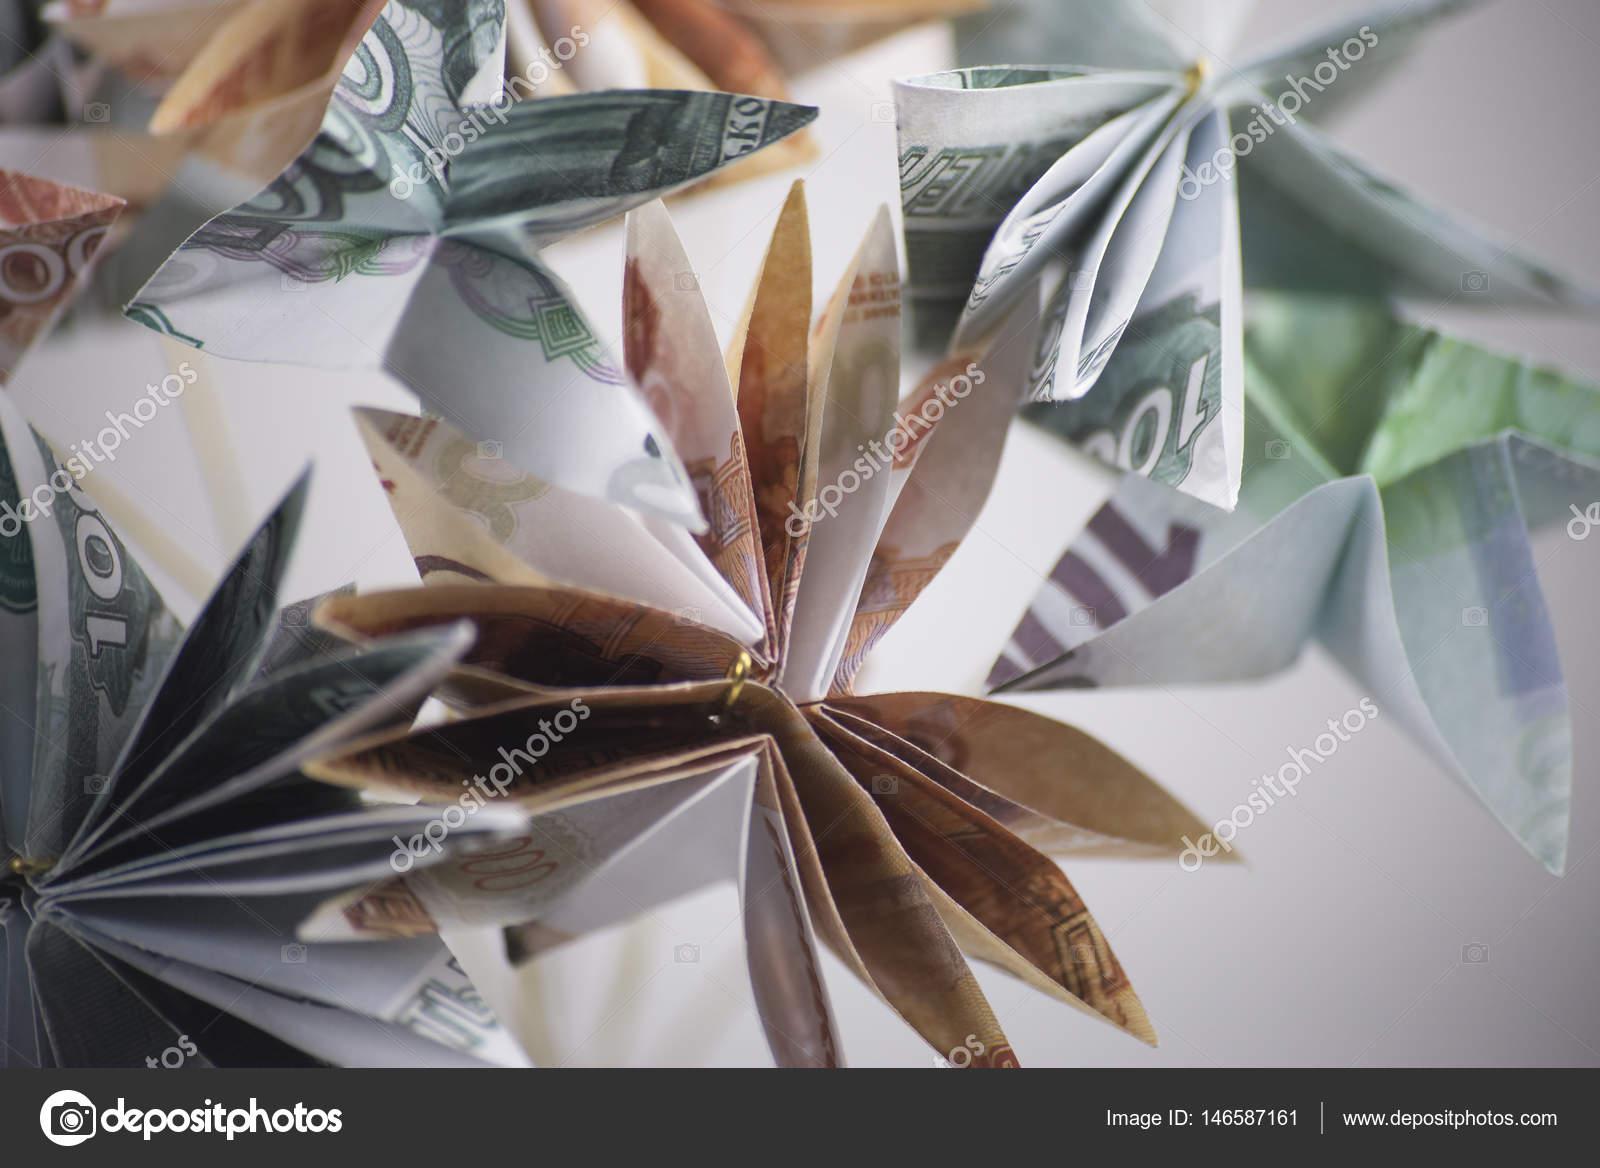 Flowers Origami Banknotes Stock Photo Artbutenkov 146587161